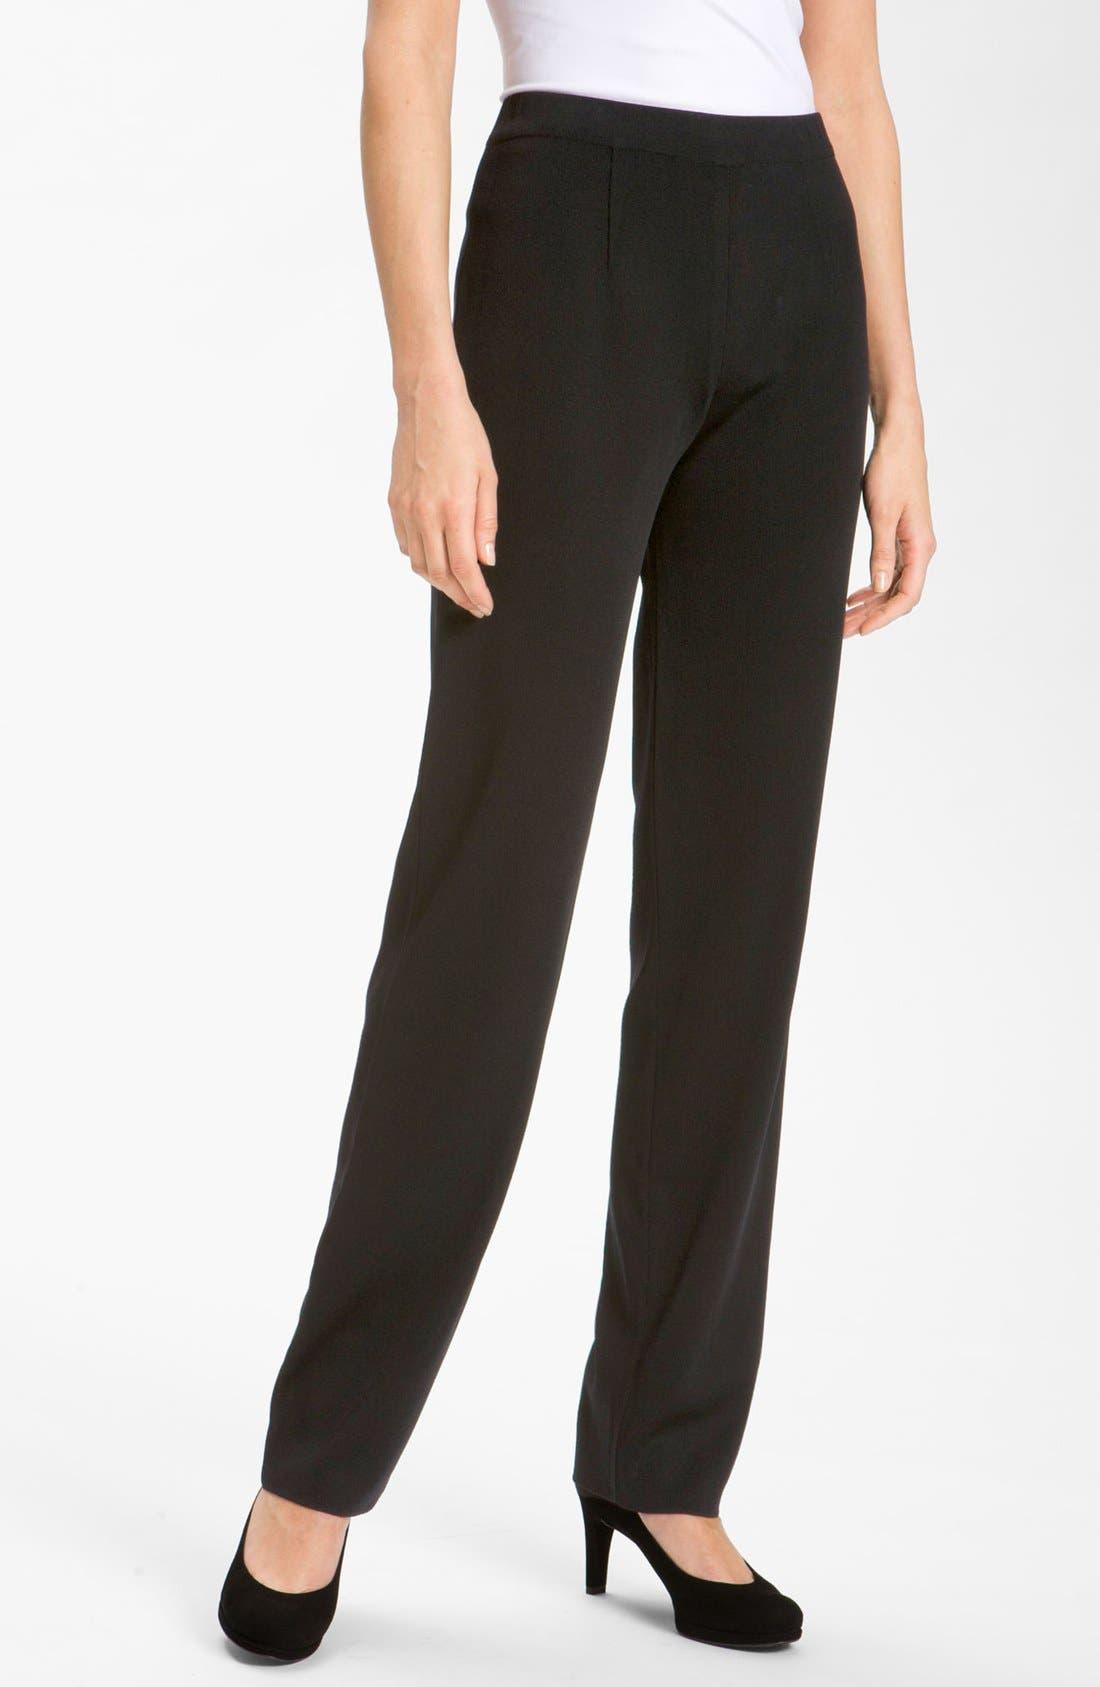 Alternate Image 1 Selected - Misook Straight Leg Knit Pants (Petite)